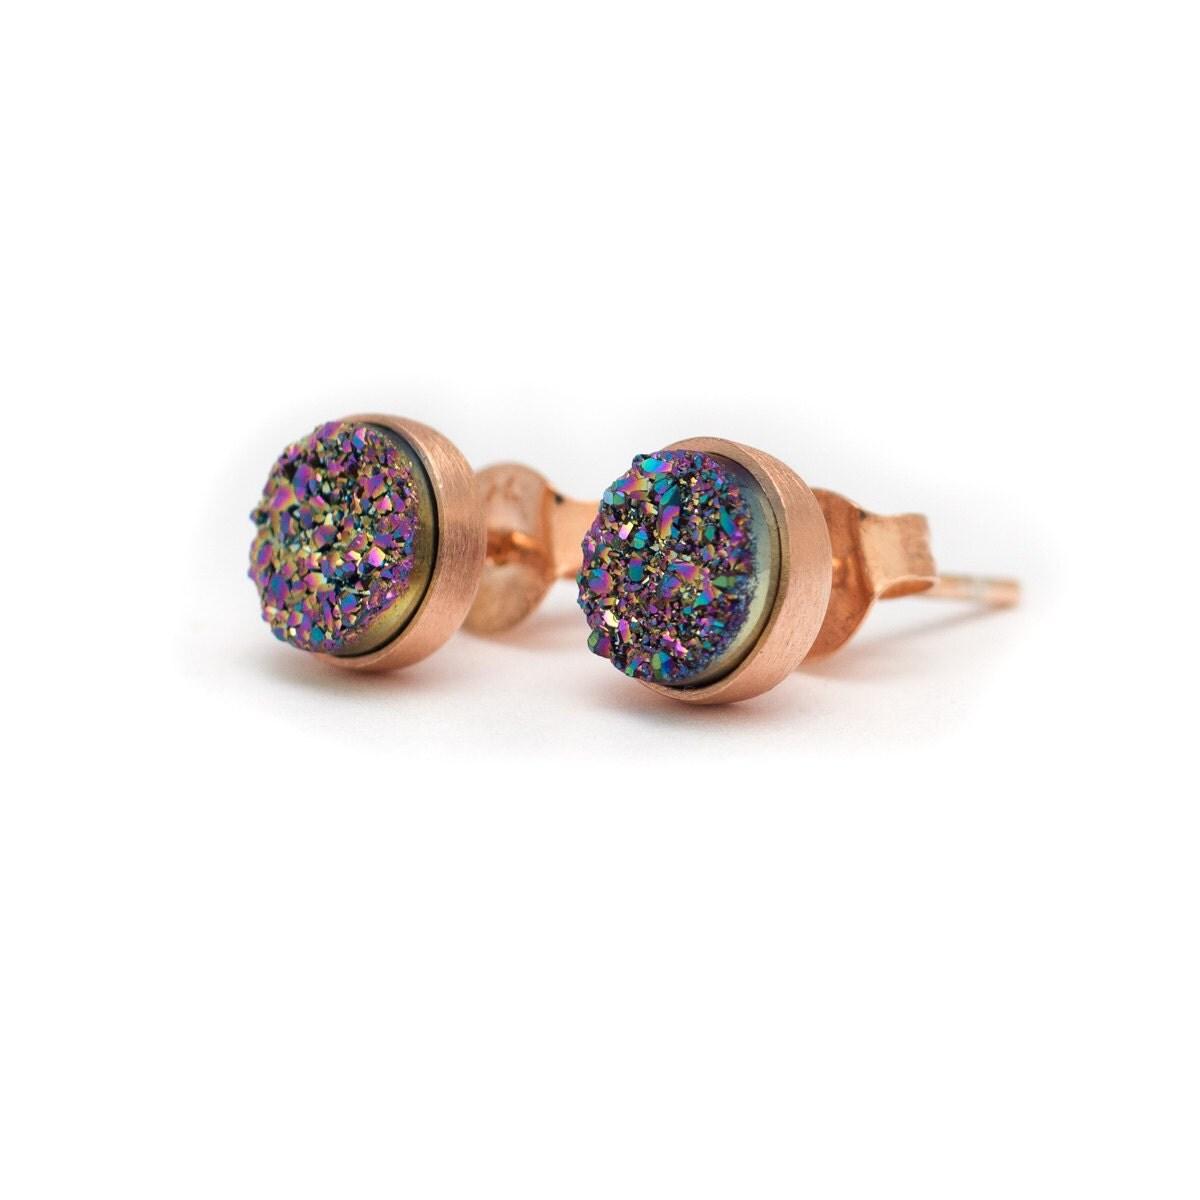 peacock in rose gold stud earrings druzy drusy quartz. Black Bedroom Furniture Sets. Home Design Ideas